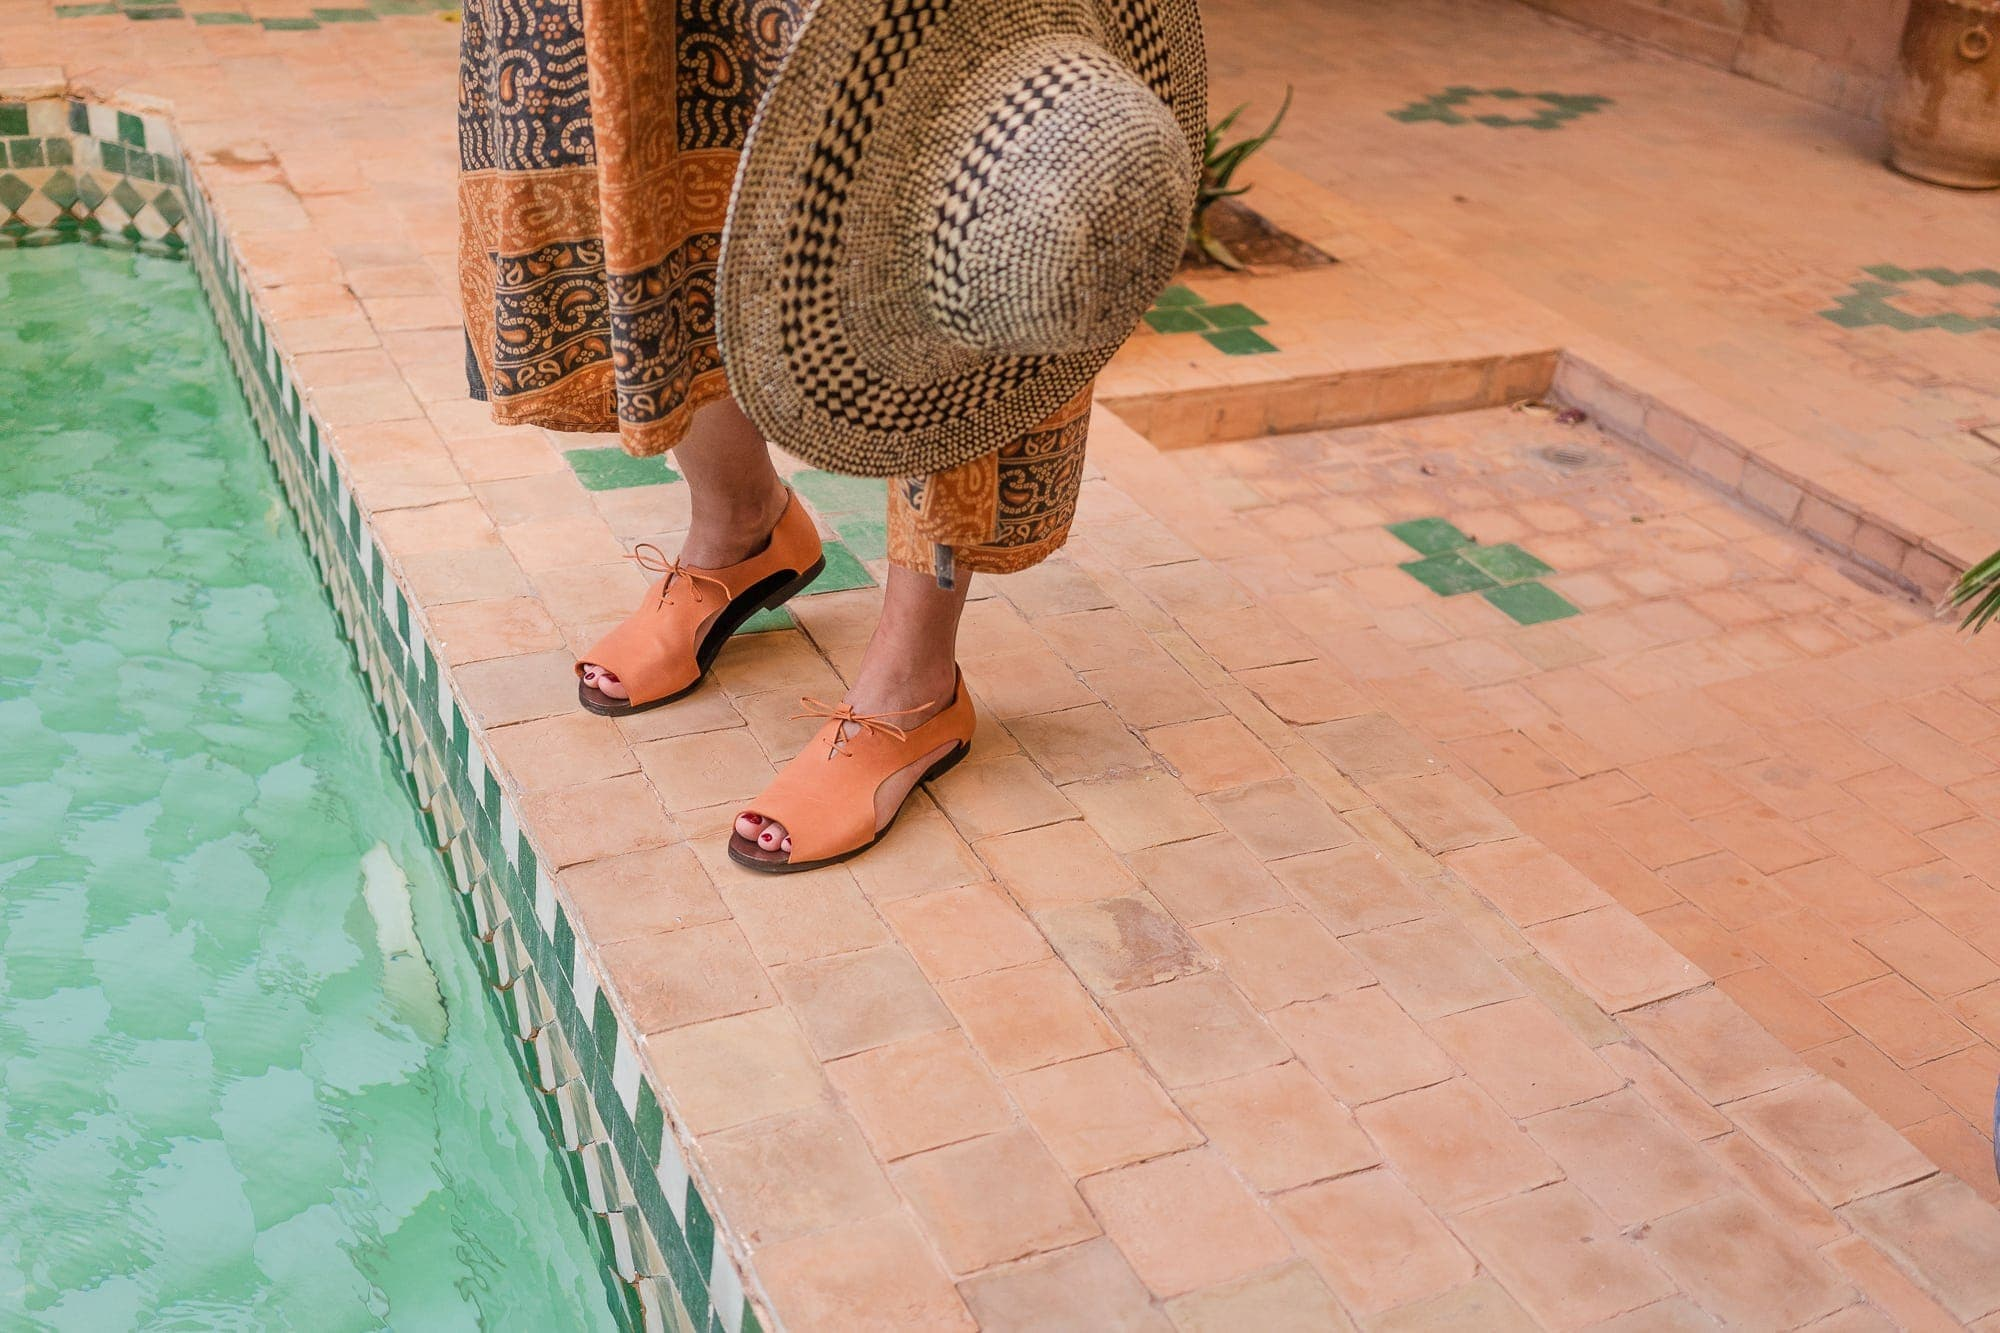 Morocco-kasbah-cousin-sandals-2